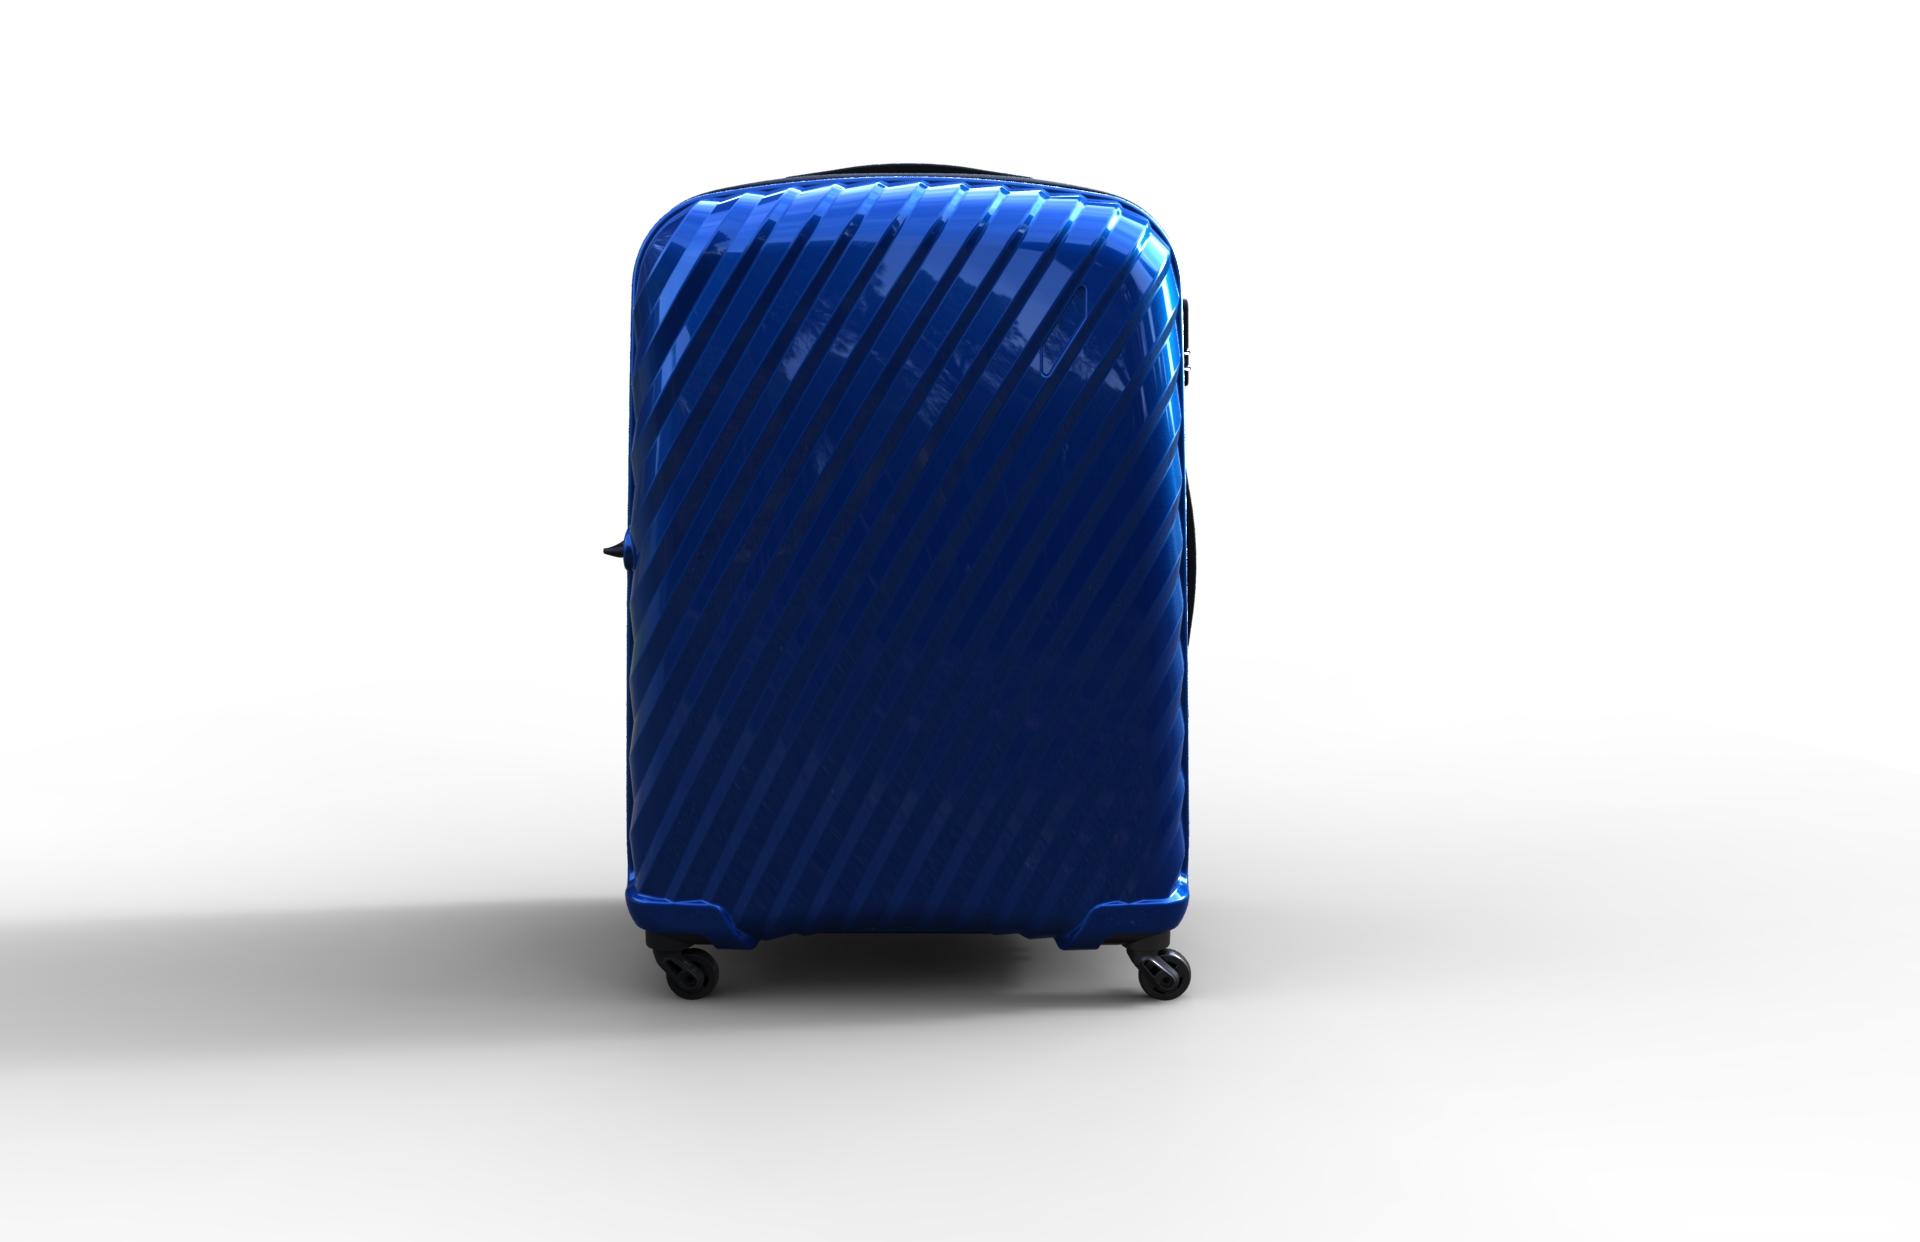 trolley suitcase bag 03 3d model max fbx ma mb obj 286004